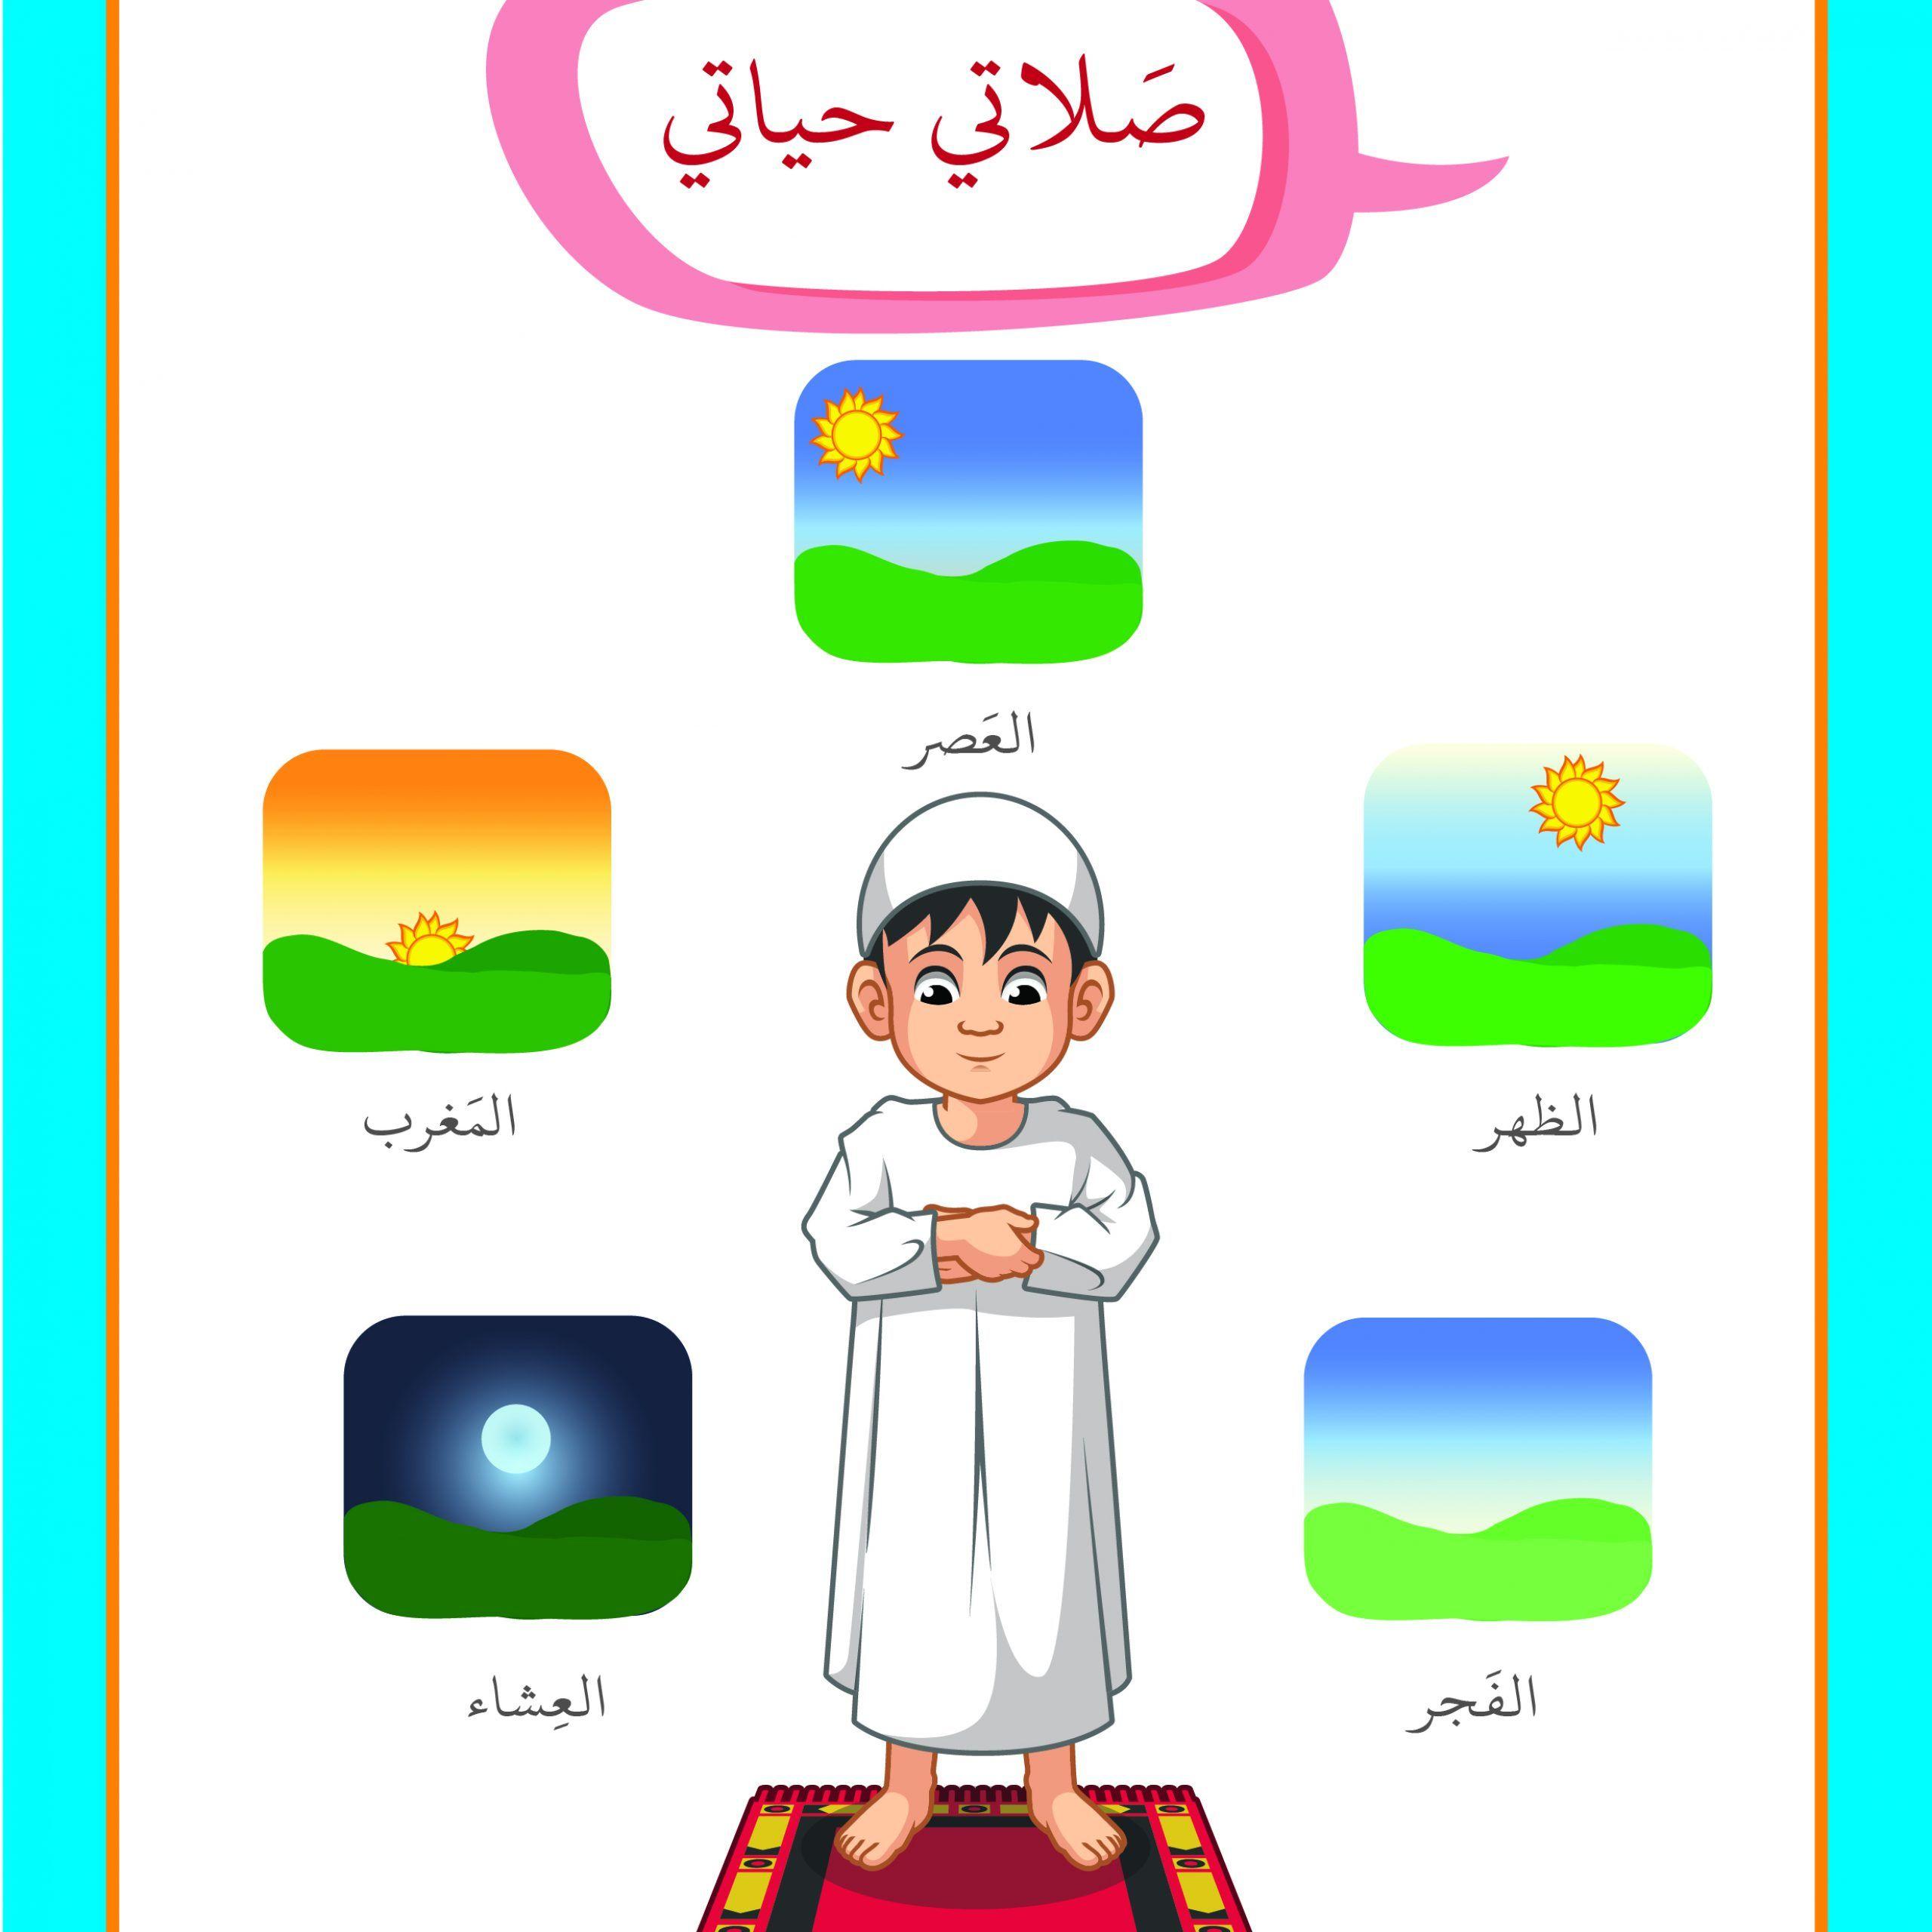 الصلاة Muslim Kids Activities Islamic Kids Activities Teaching Kids Respect